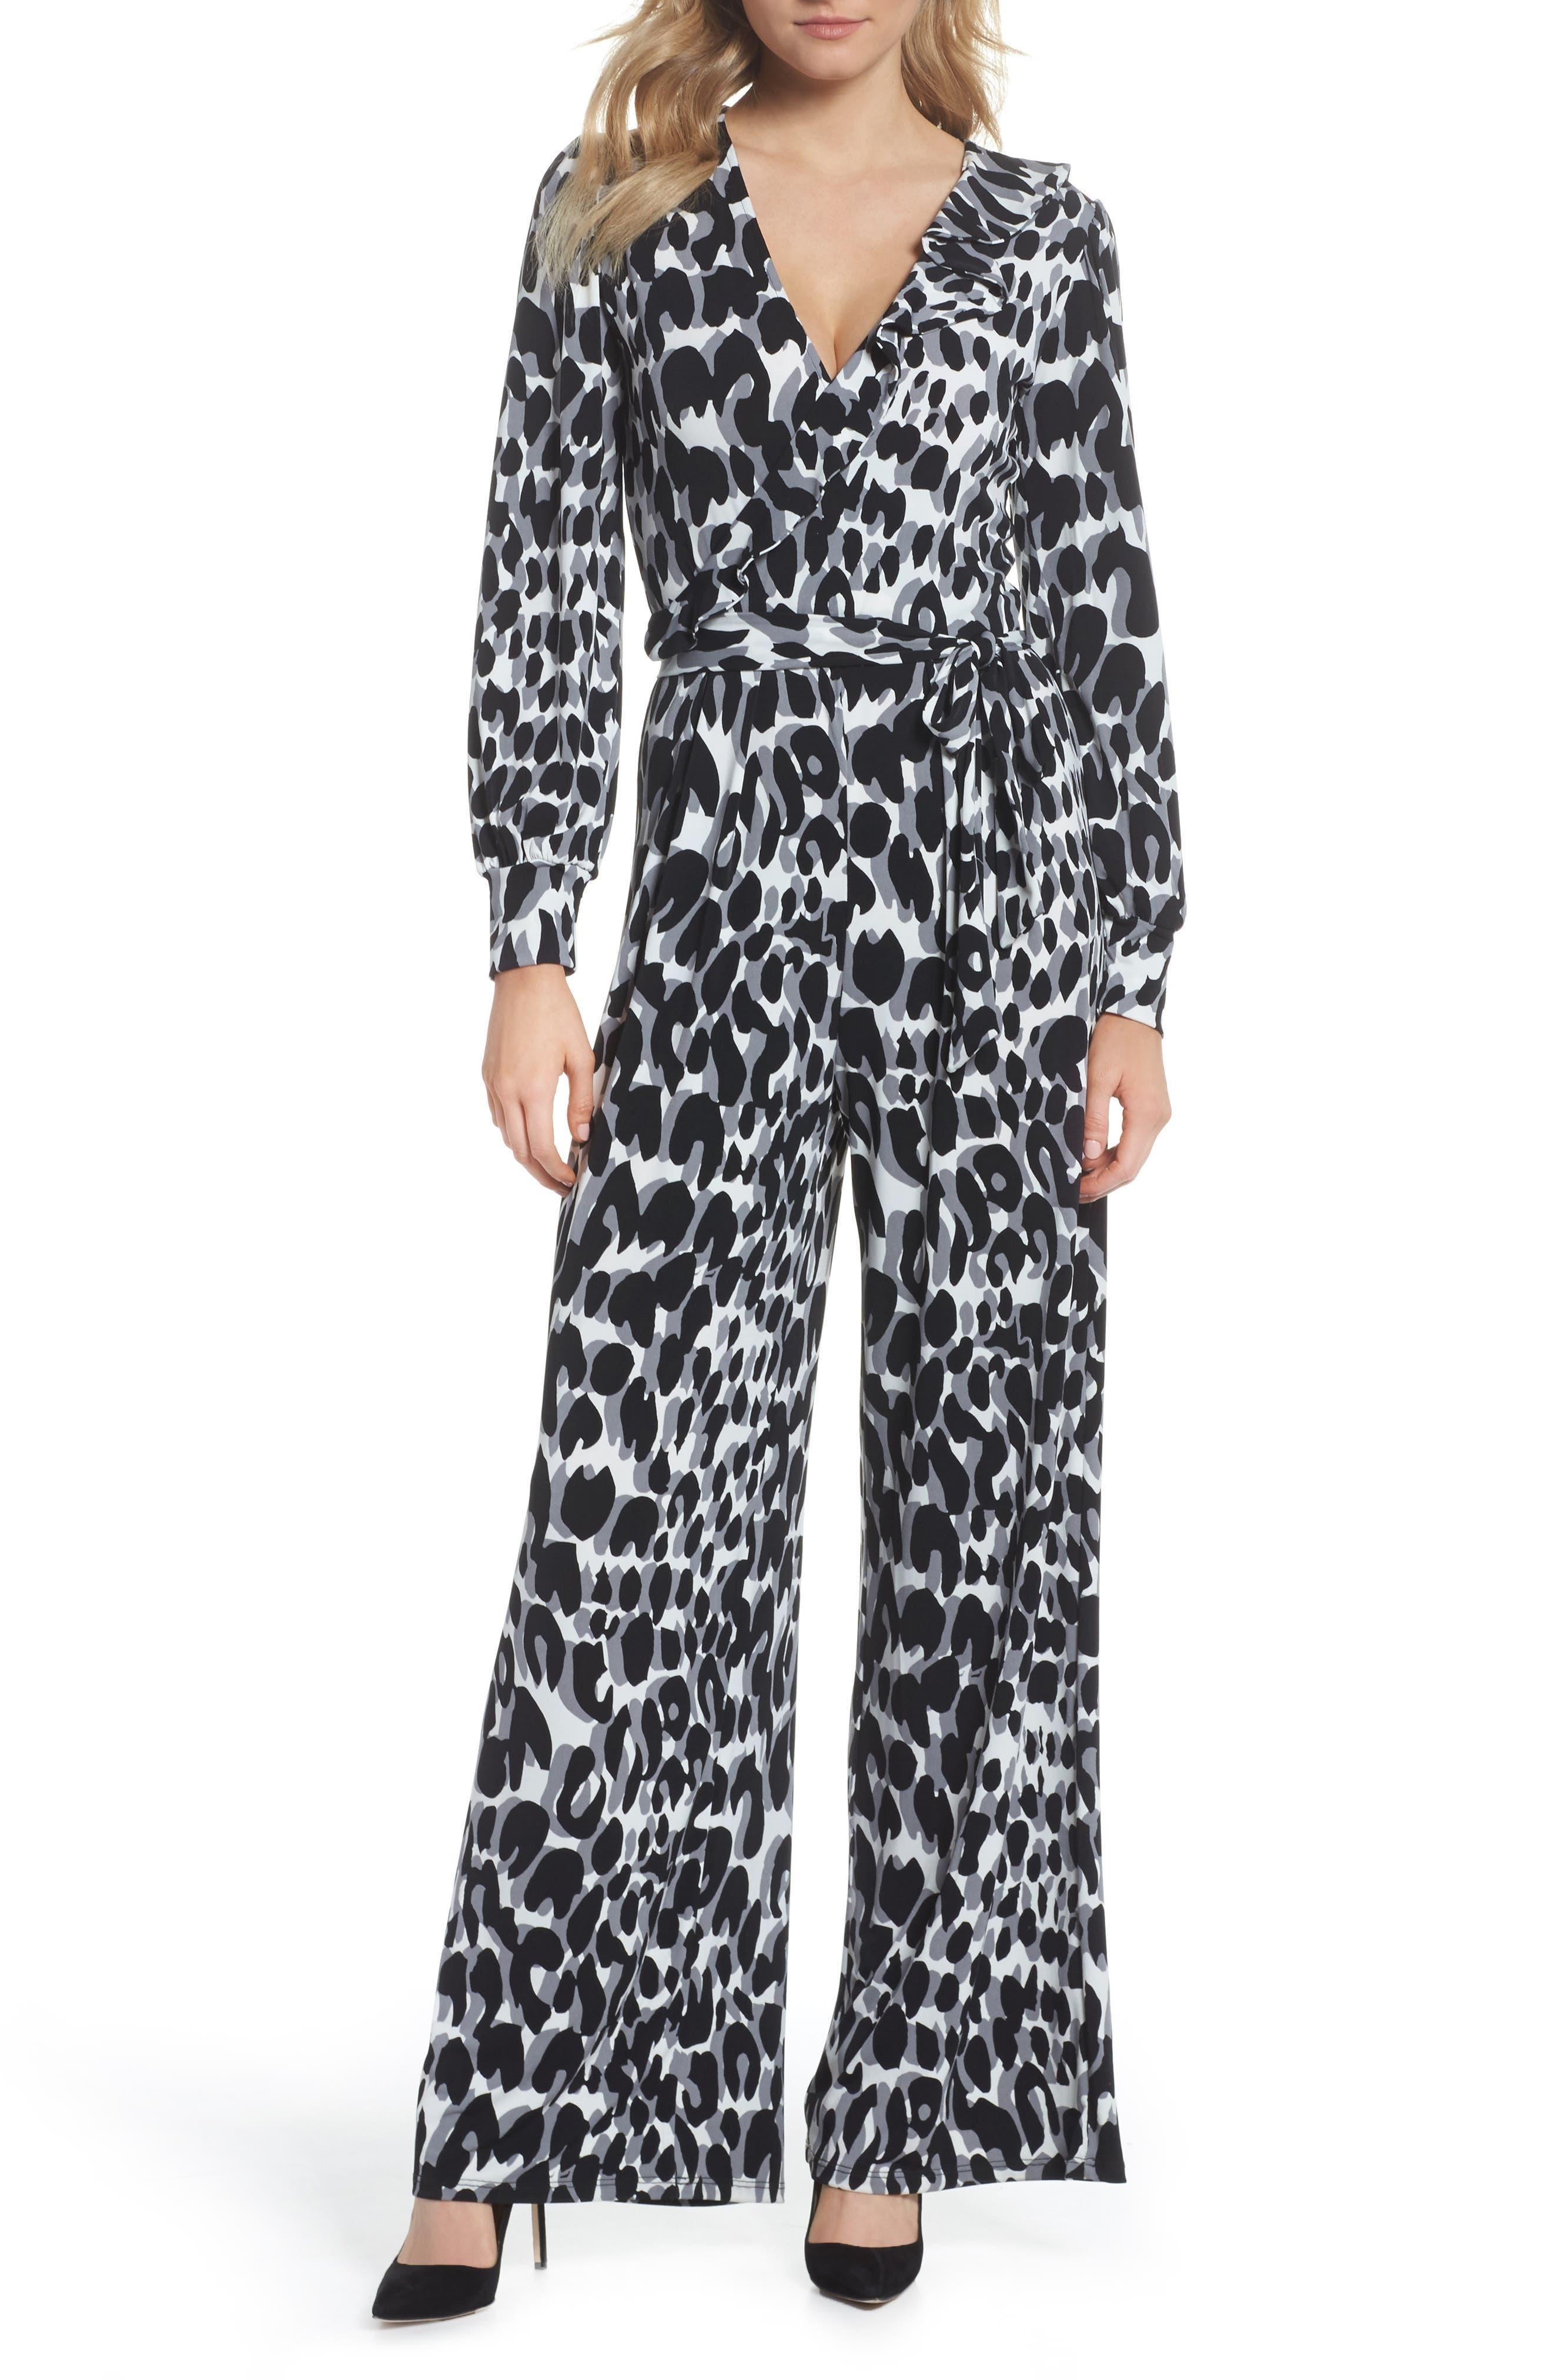 Vintage High Waisted Trousers, Sailor Pants, Jeans Womens Leota Julie Print Ruffle Jumpsuit $94.80 AT vintagedancer.com